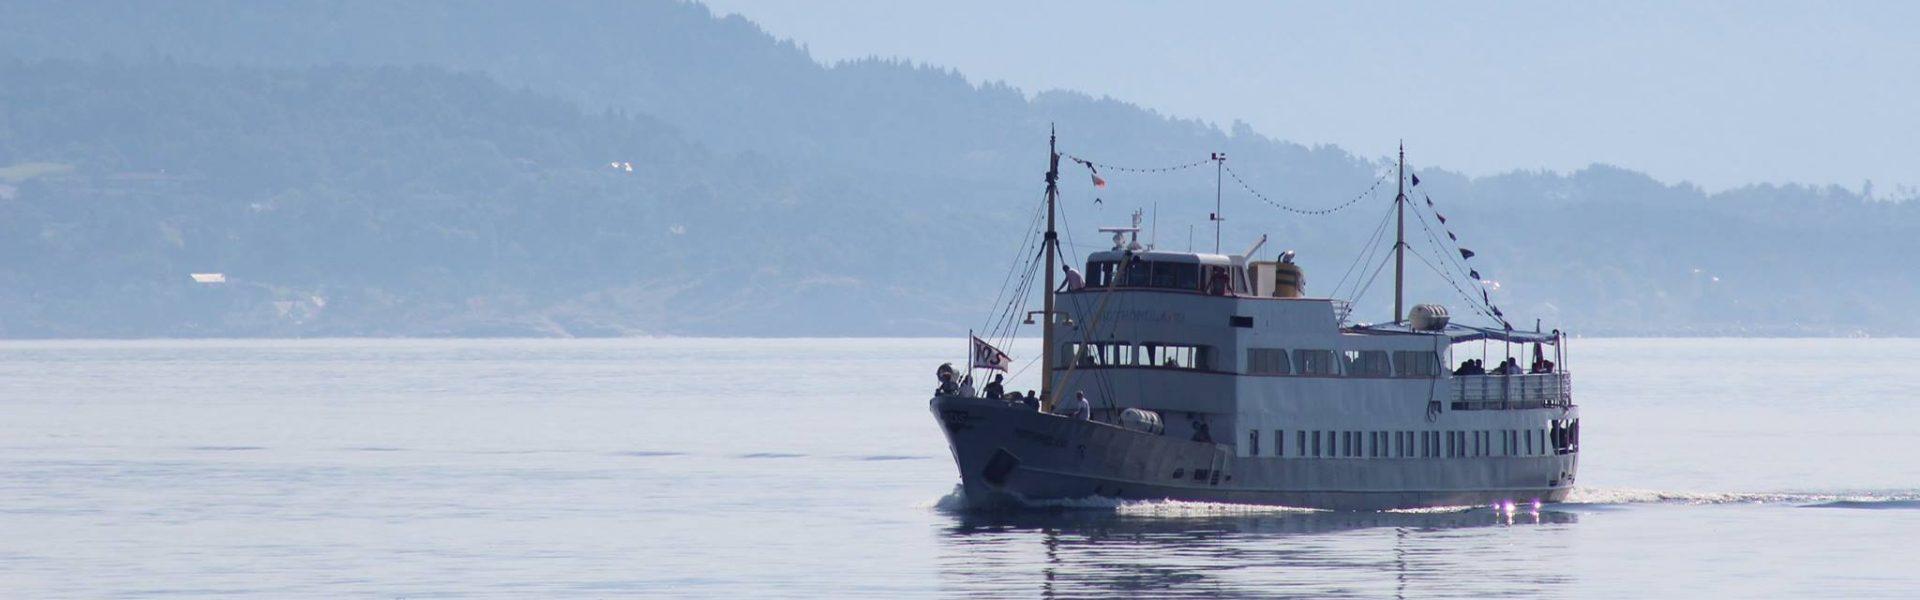 Midthordlandske  Dampskibsselskab